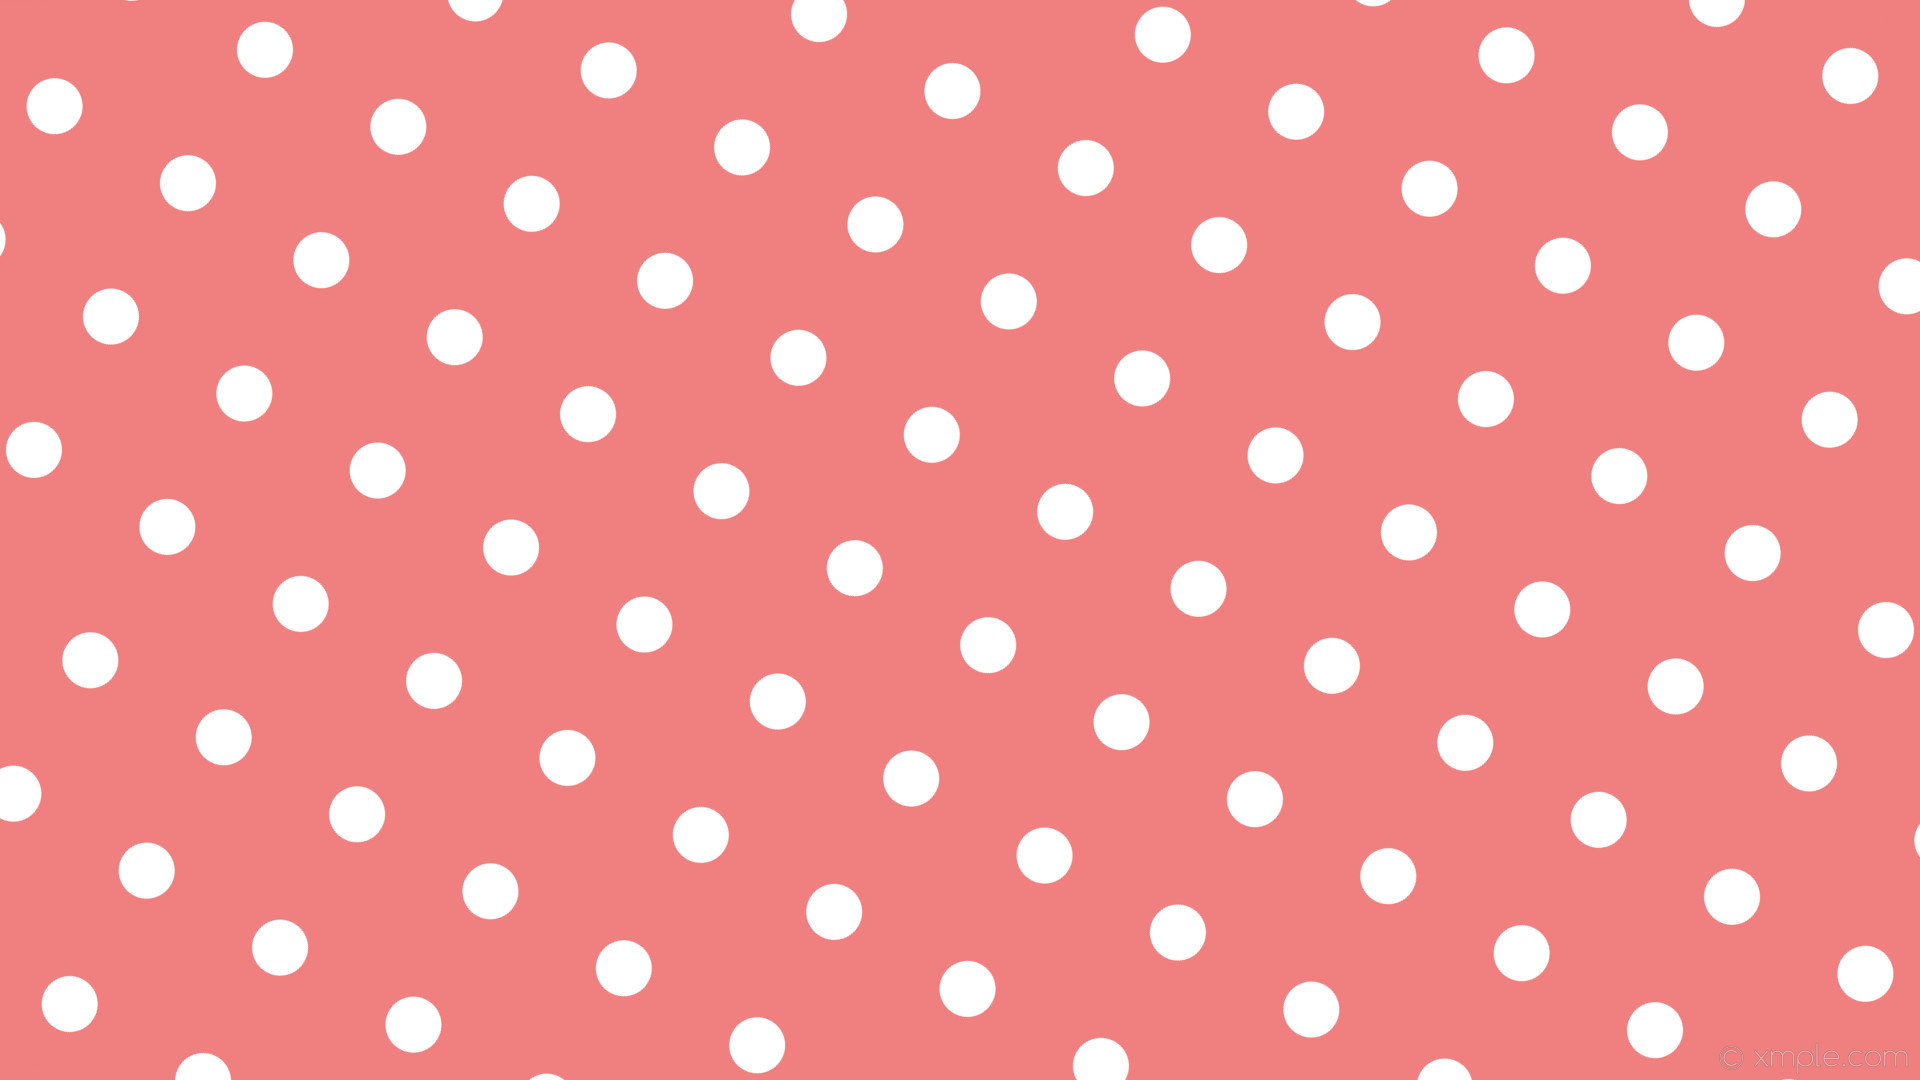 wallpaper spots red white polka dots light coral #f08080 #ffffff 240° 56px  154px